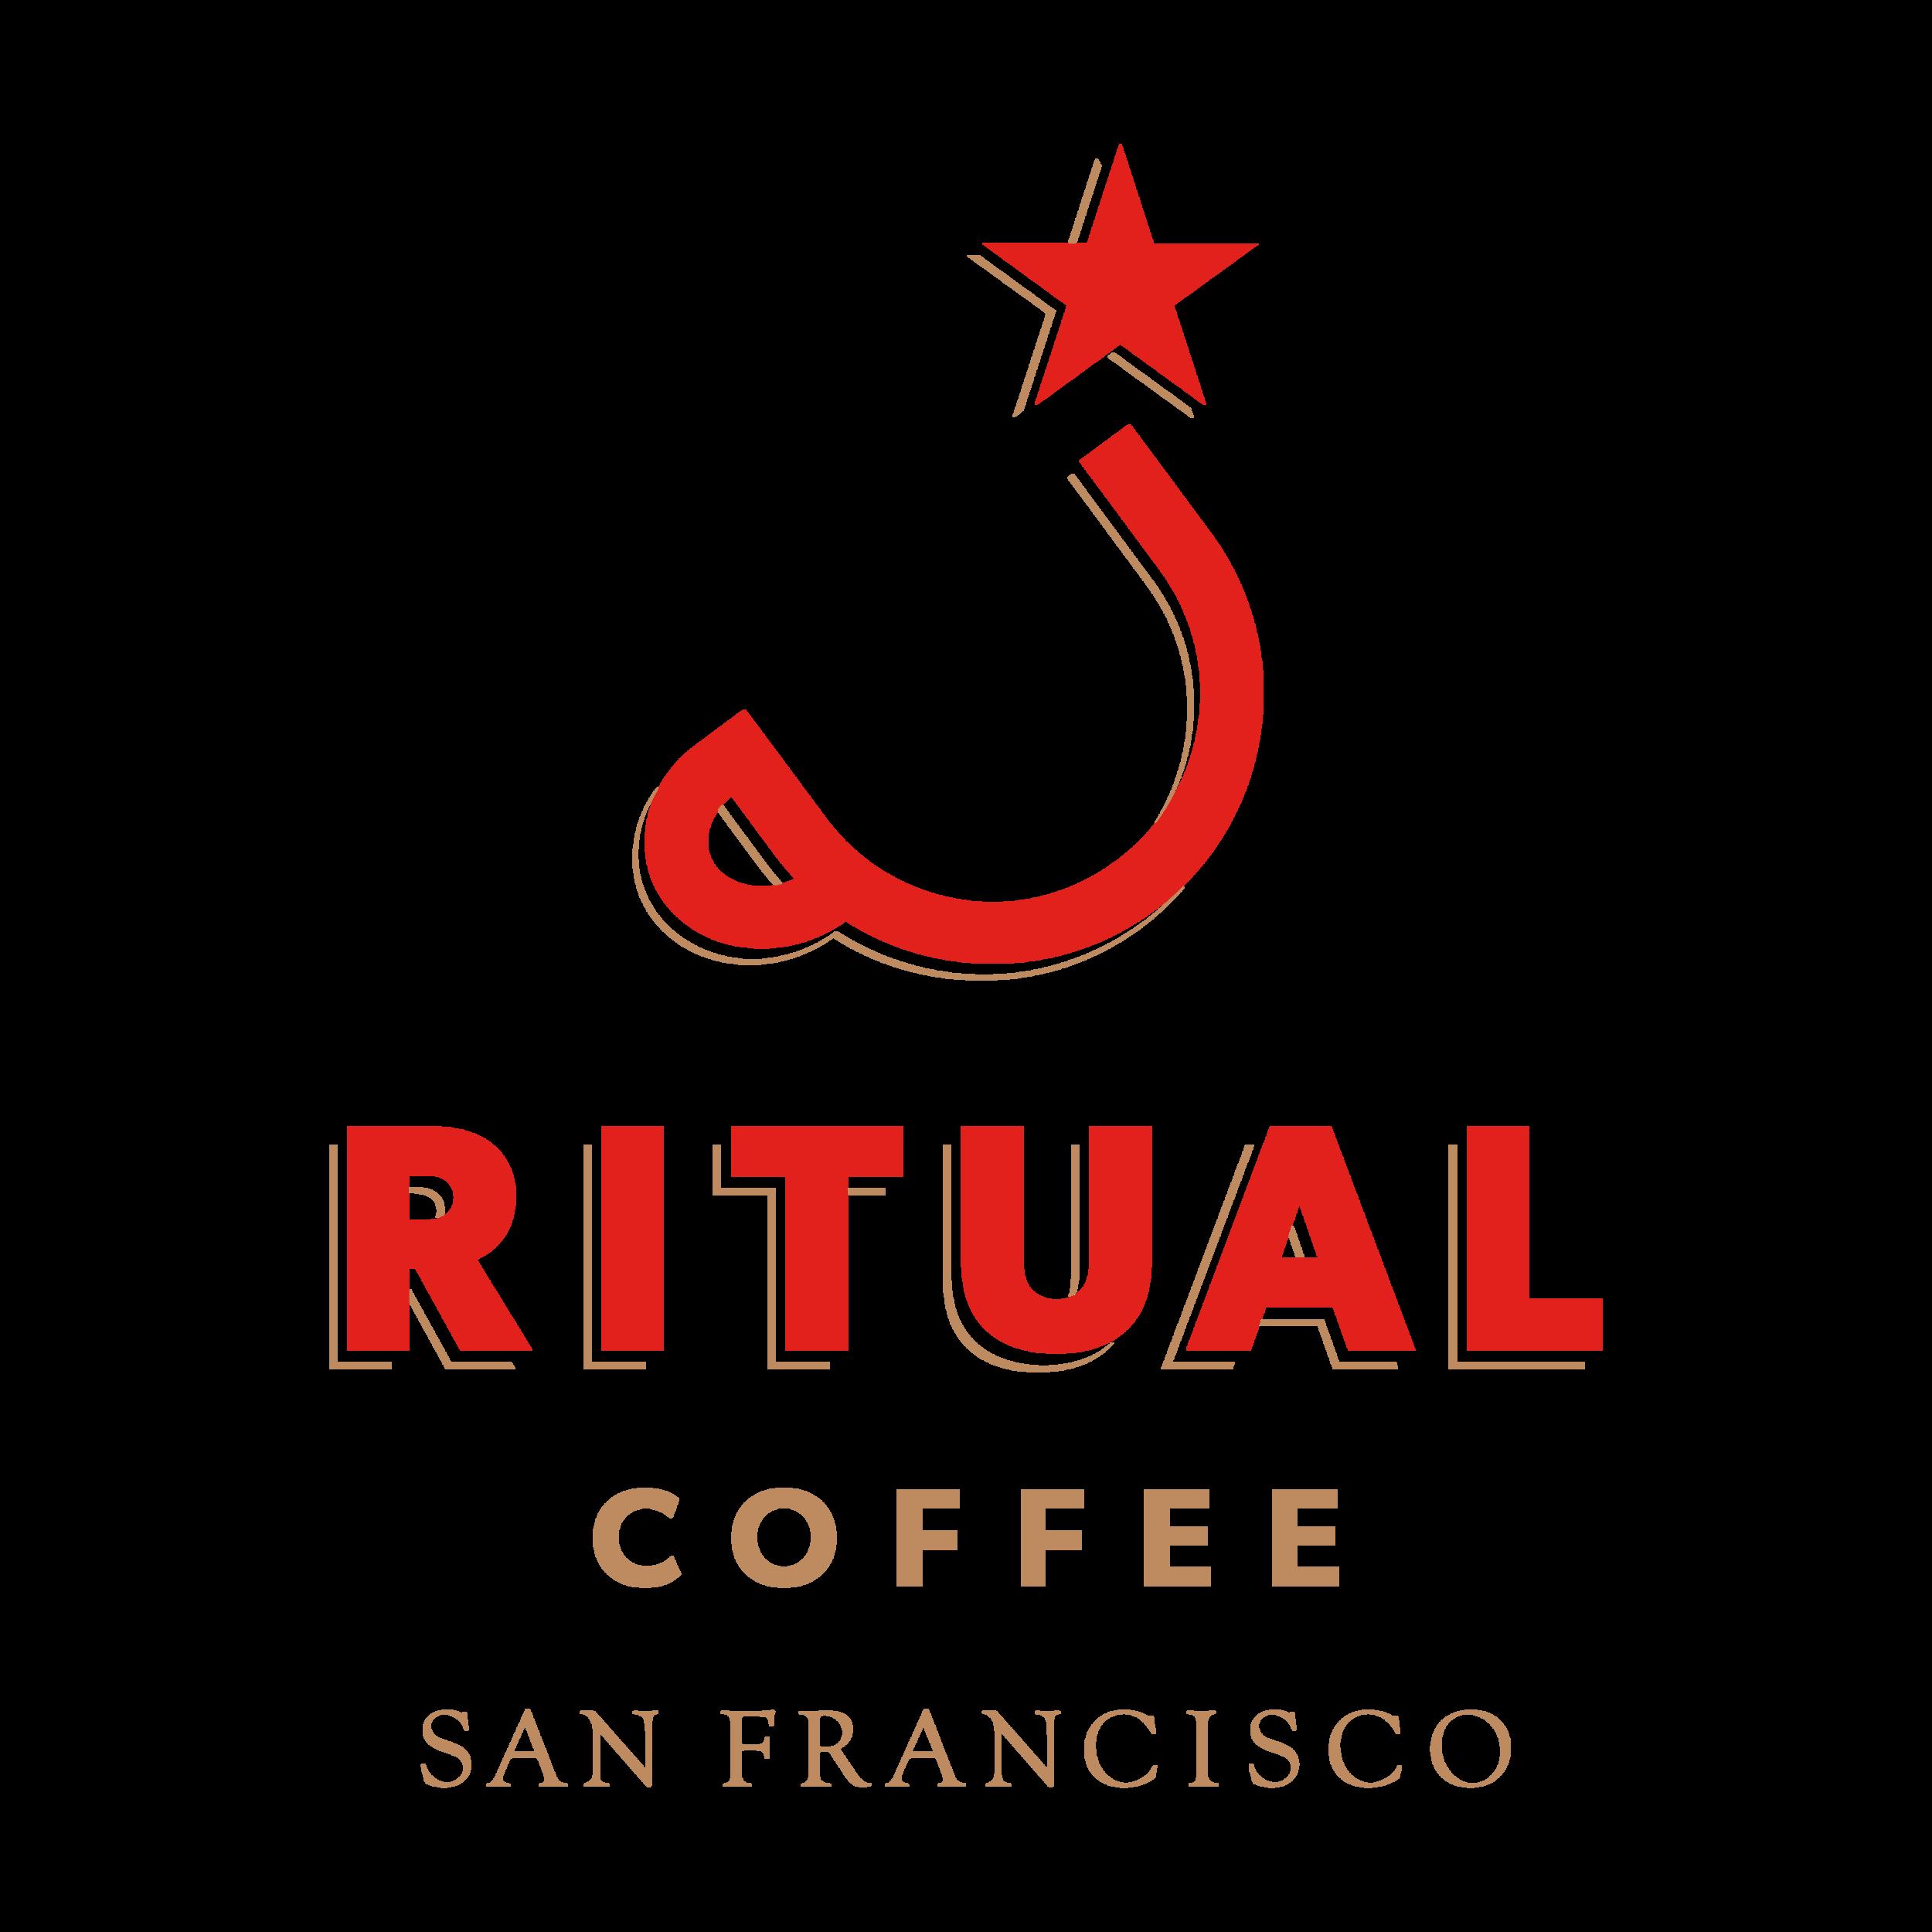 RitualCoffeeSF-RedGoldOnWhite-01.png